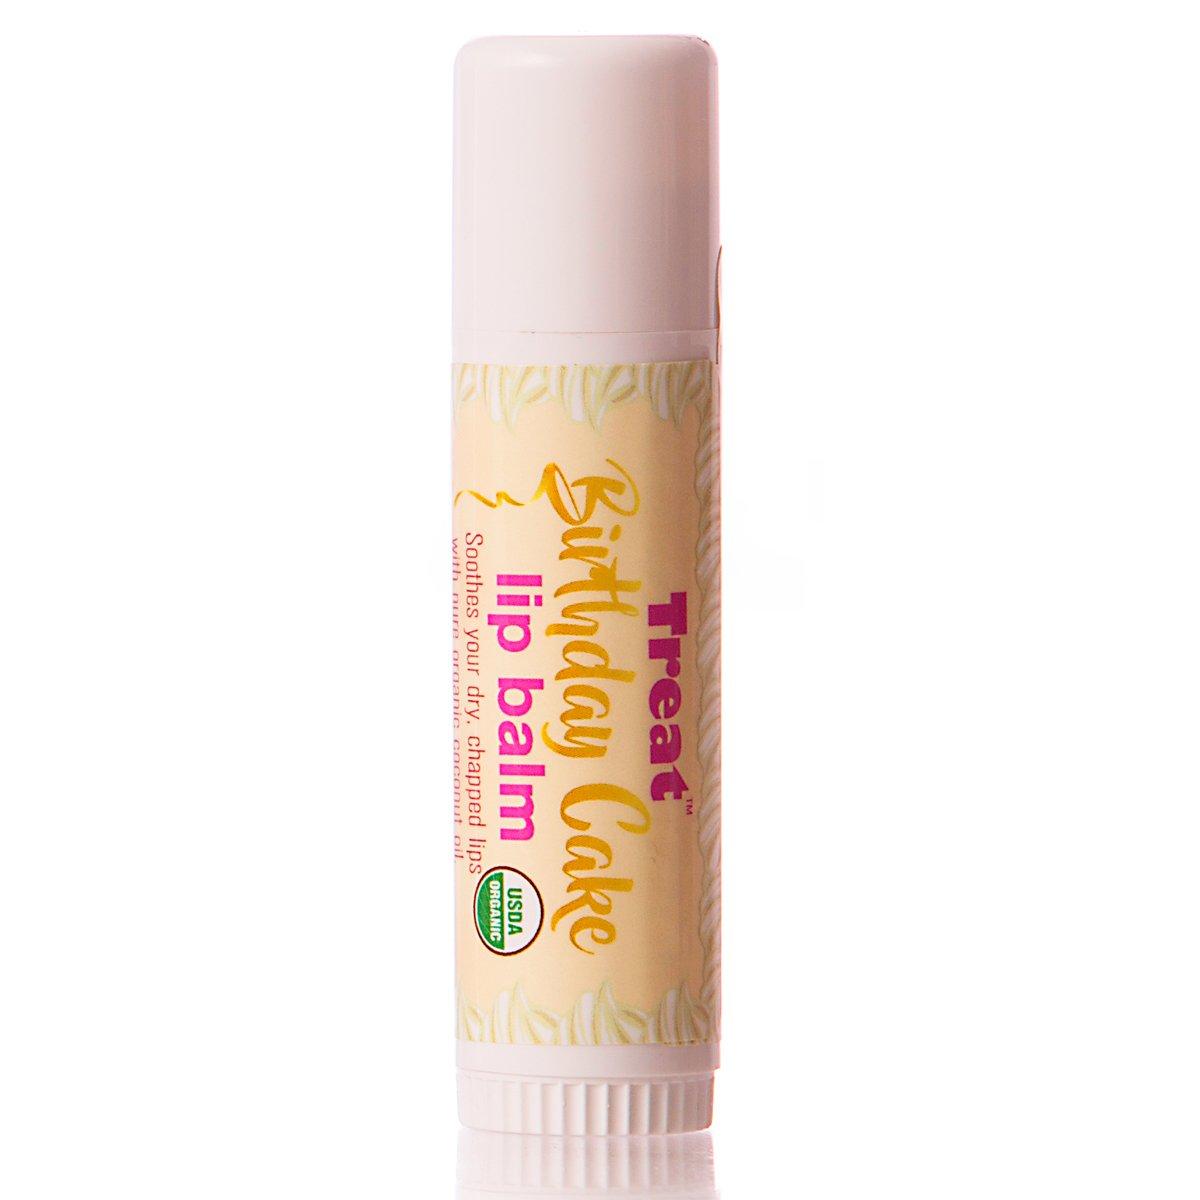 Amazon TREAT BEAUTY Organic Jumbo Birthday Cake Lip Balm 14 GR Beauty